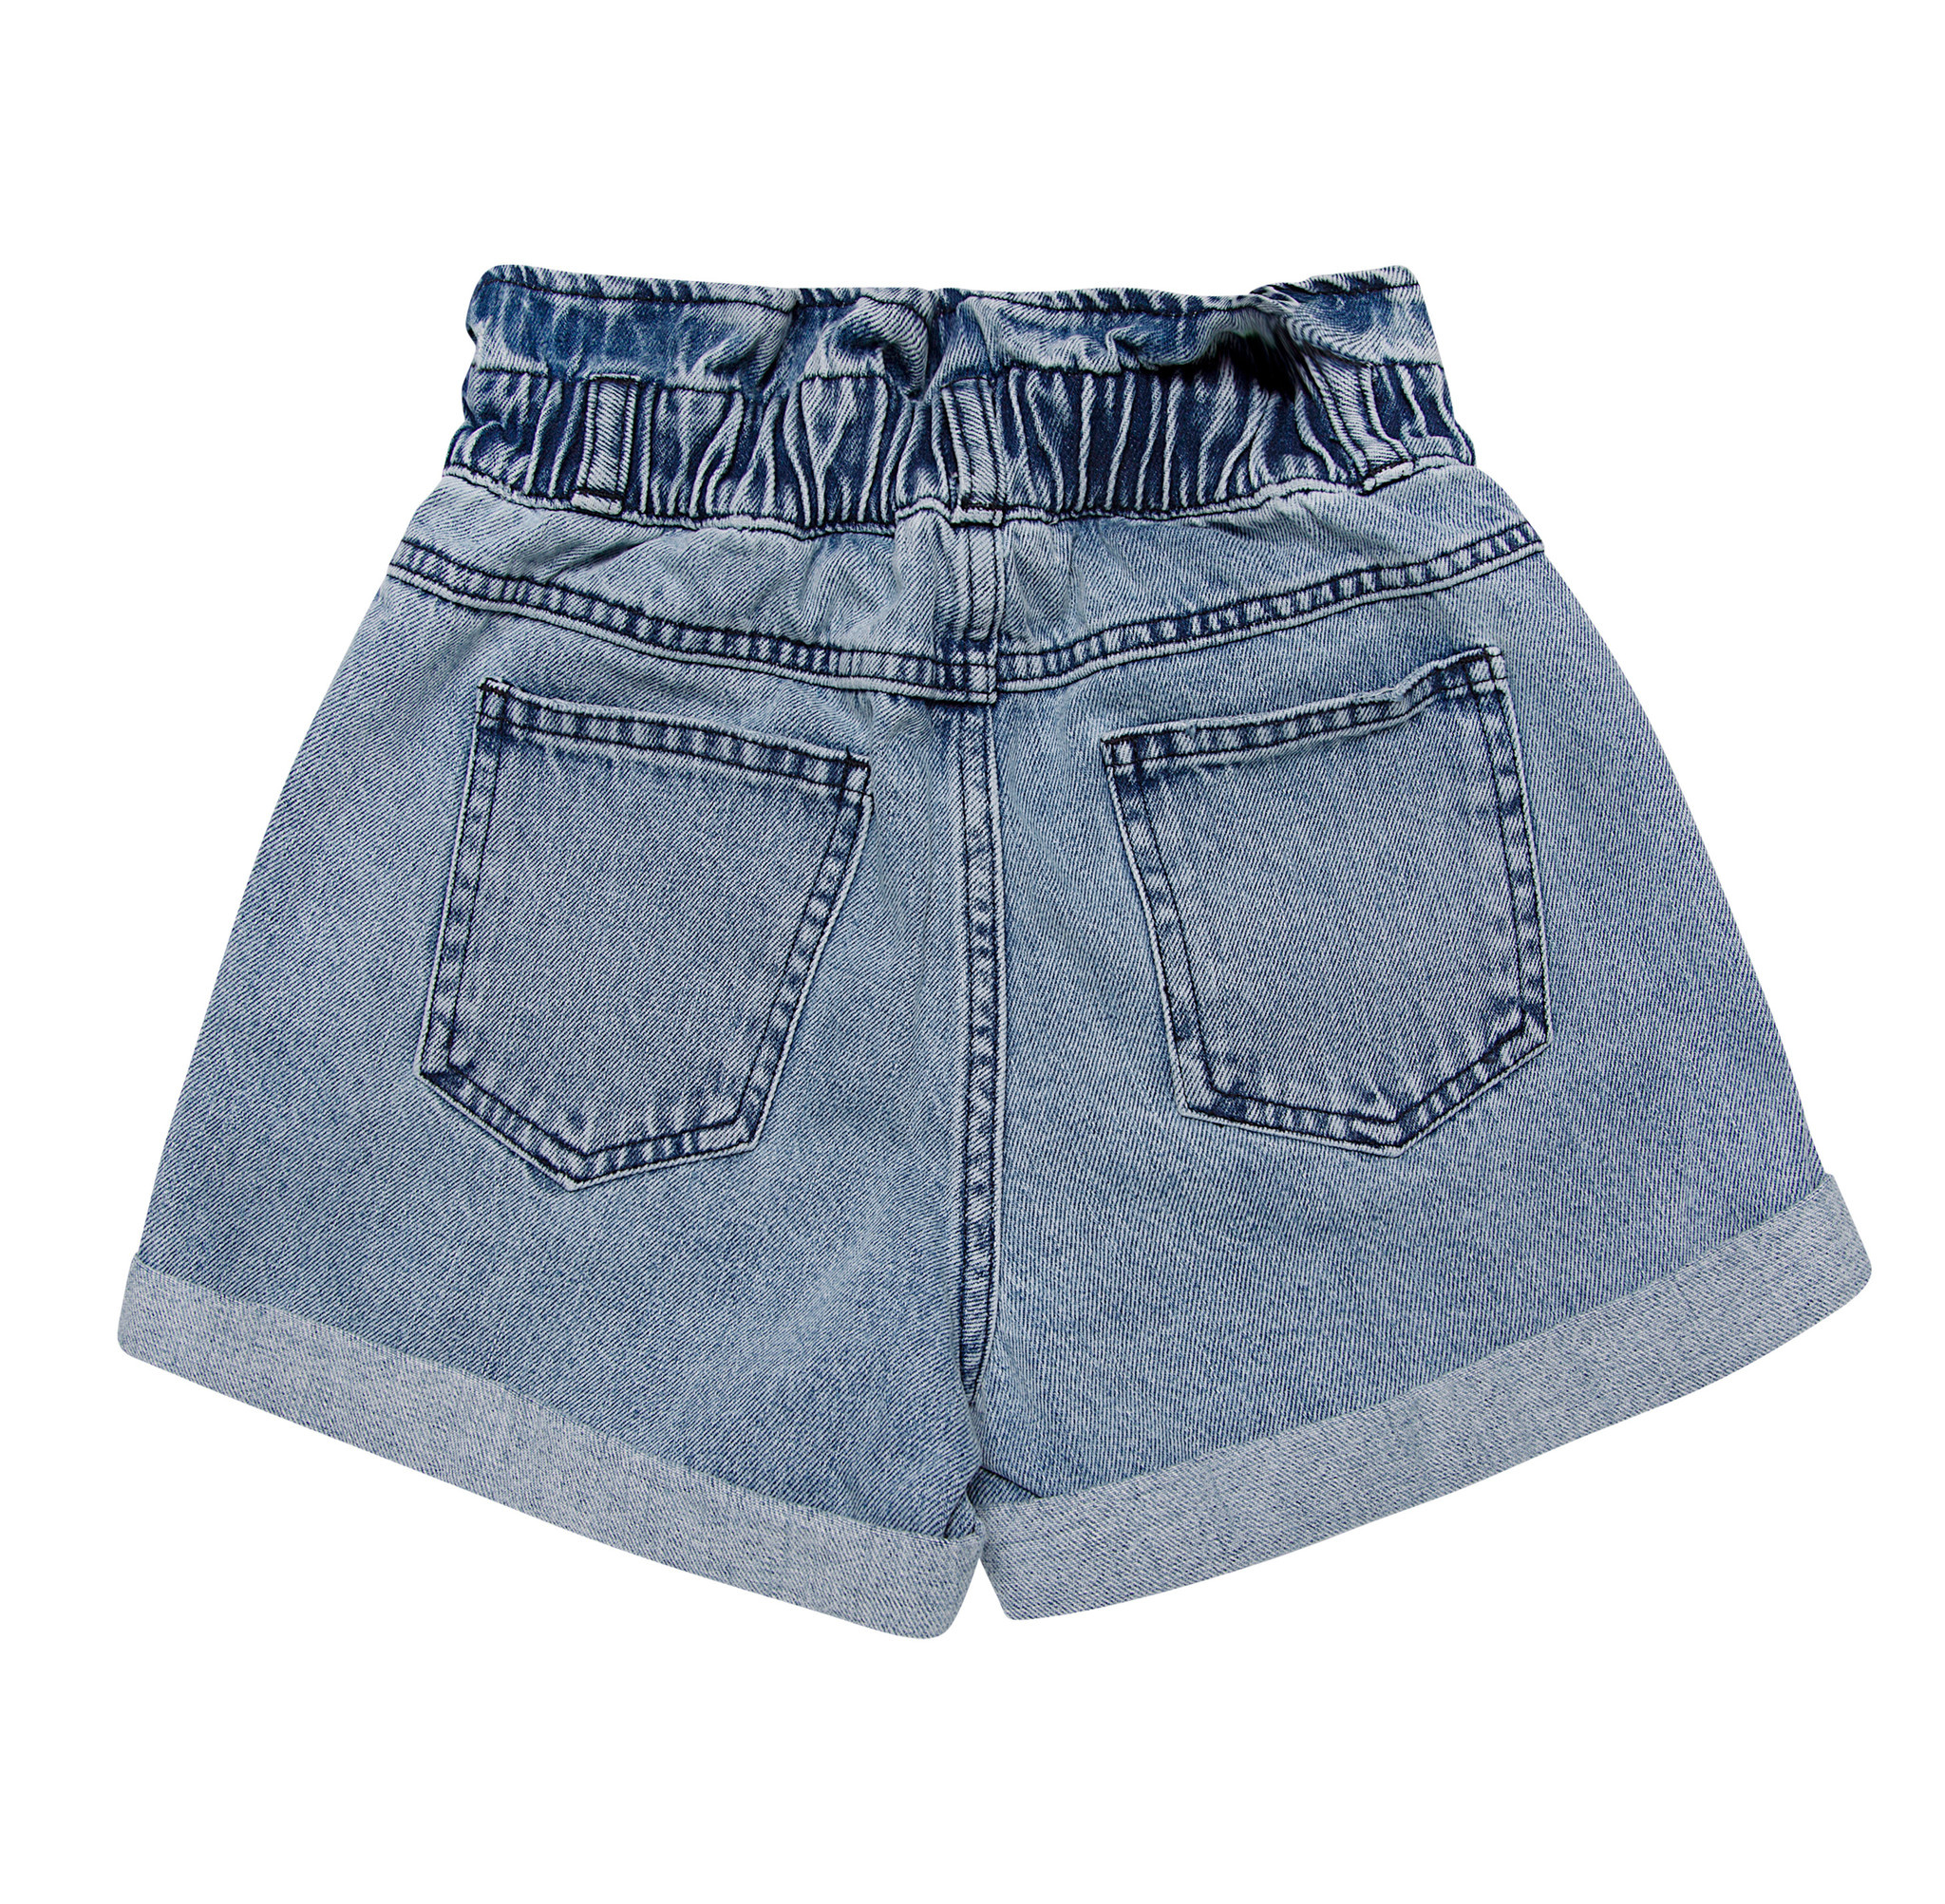 Lola short - Light Blue Denim-3